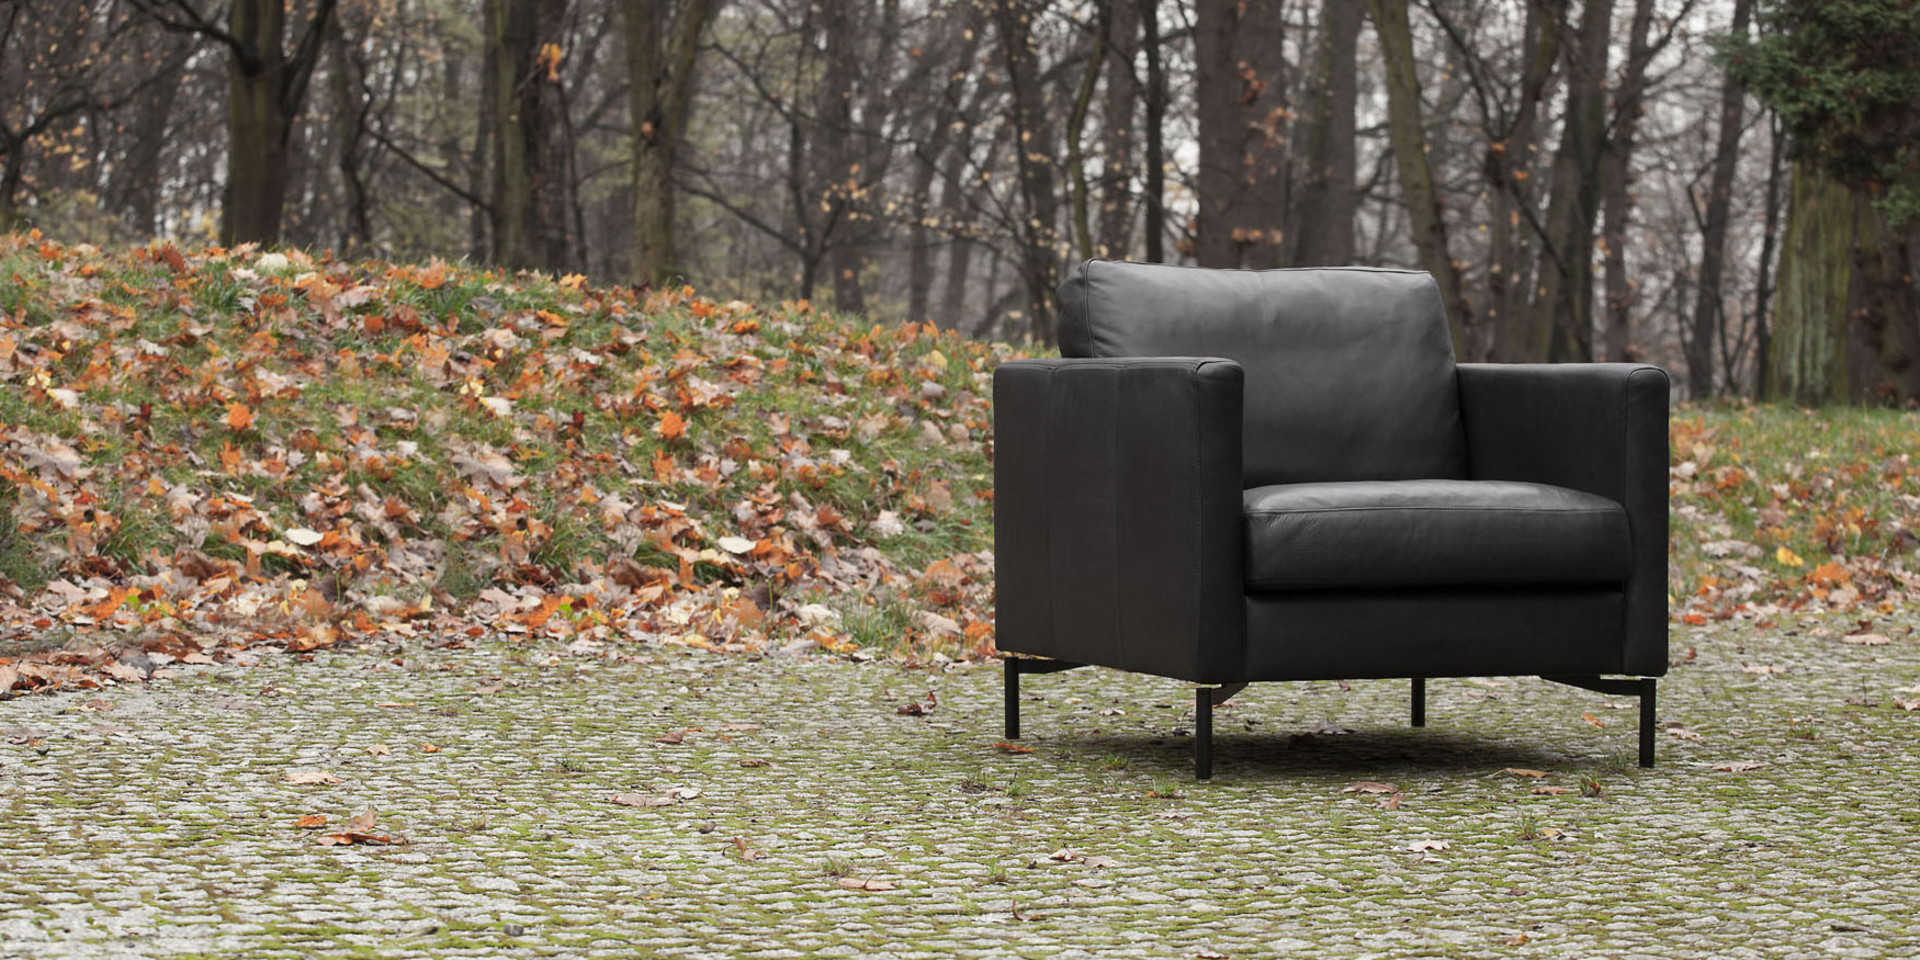 sits-impulse-fauteuil-aniline-black-pieds-145-metal-nature